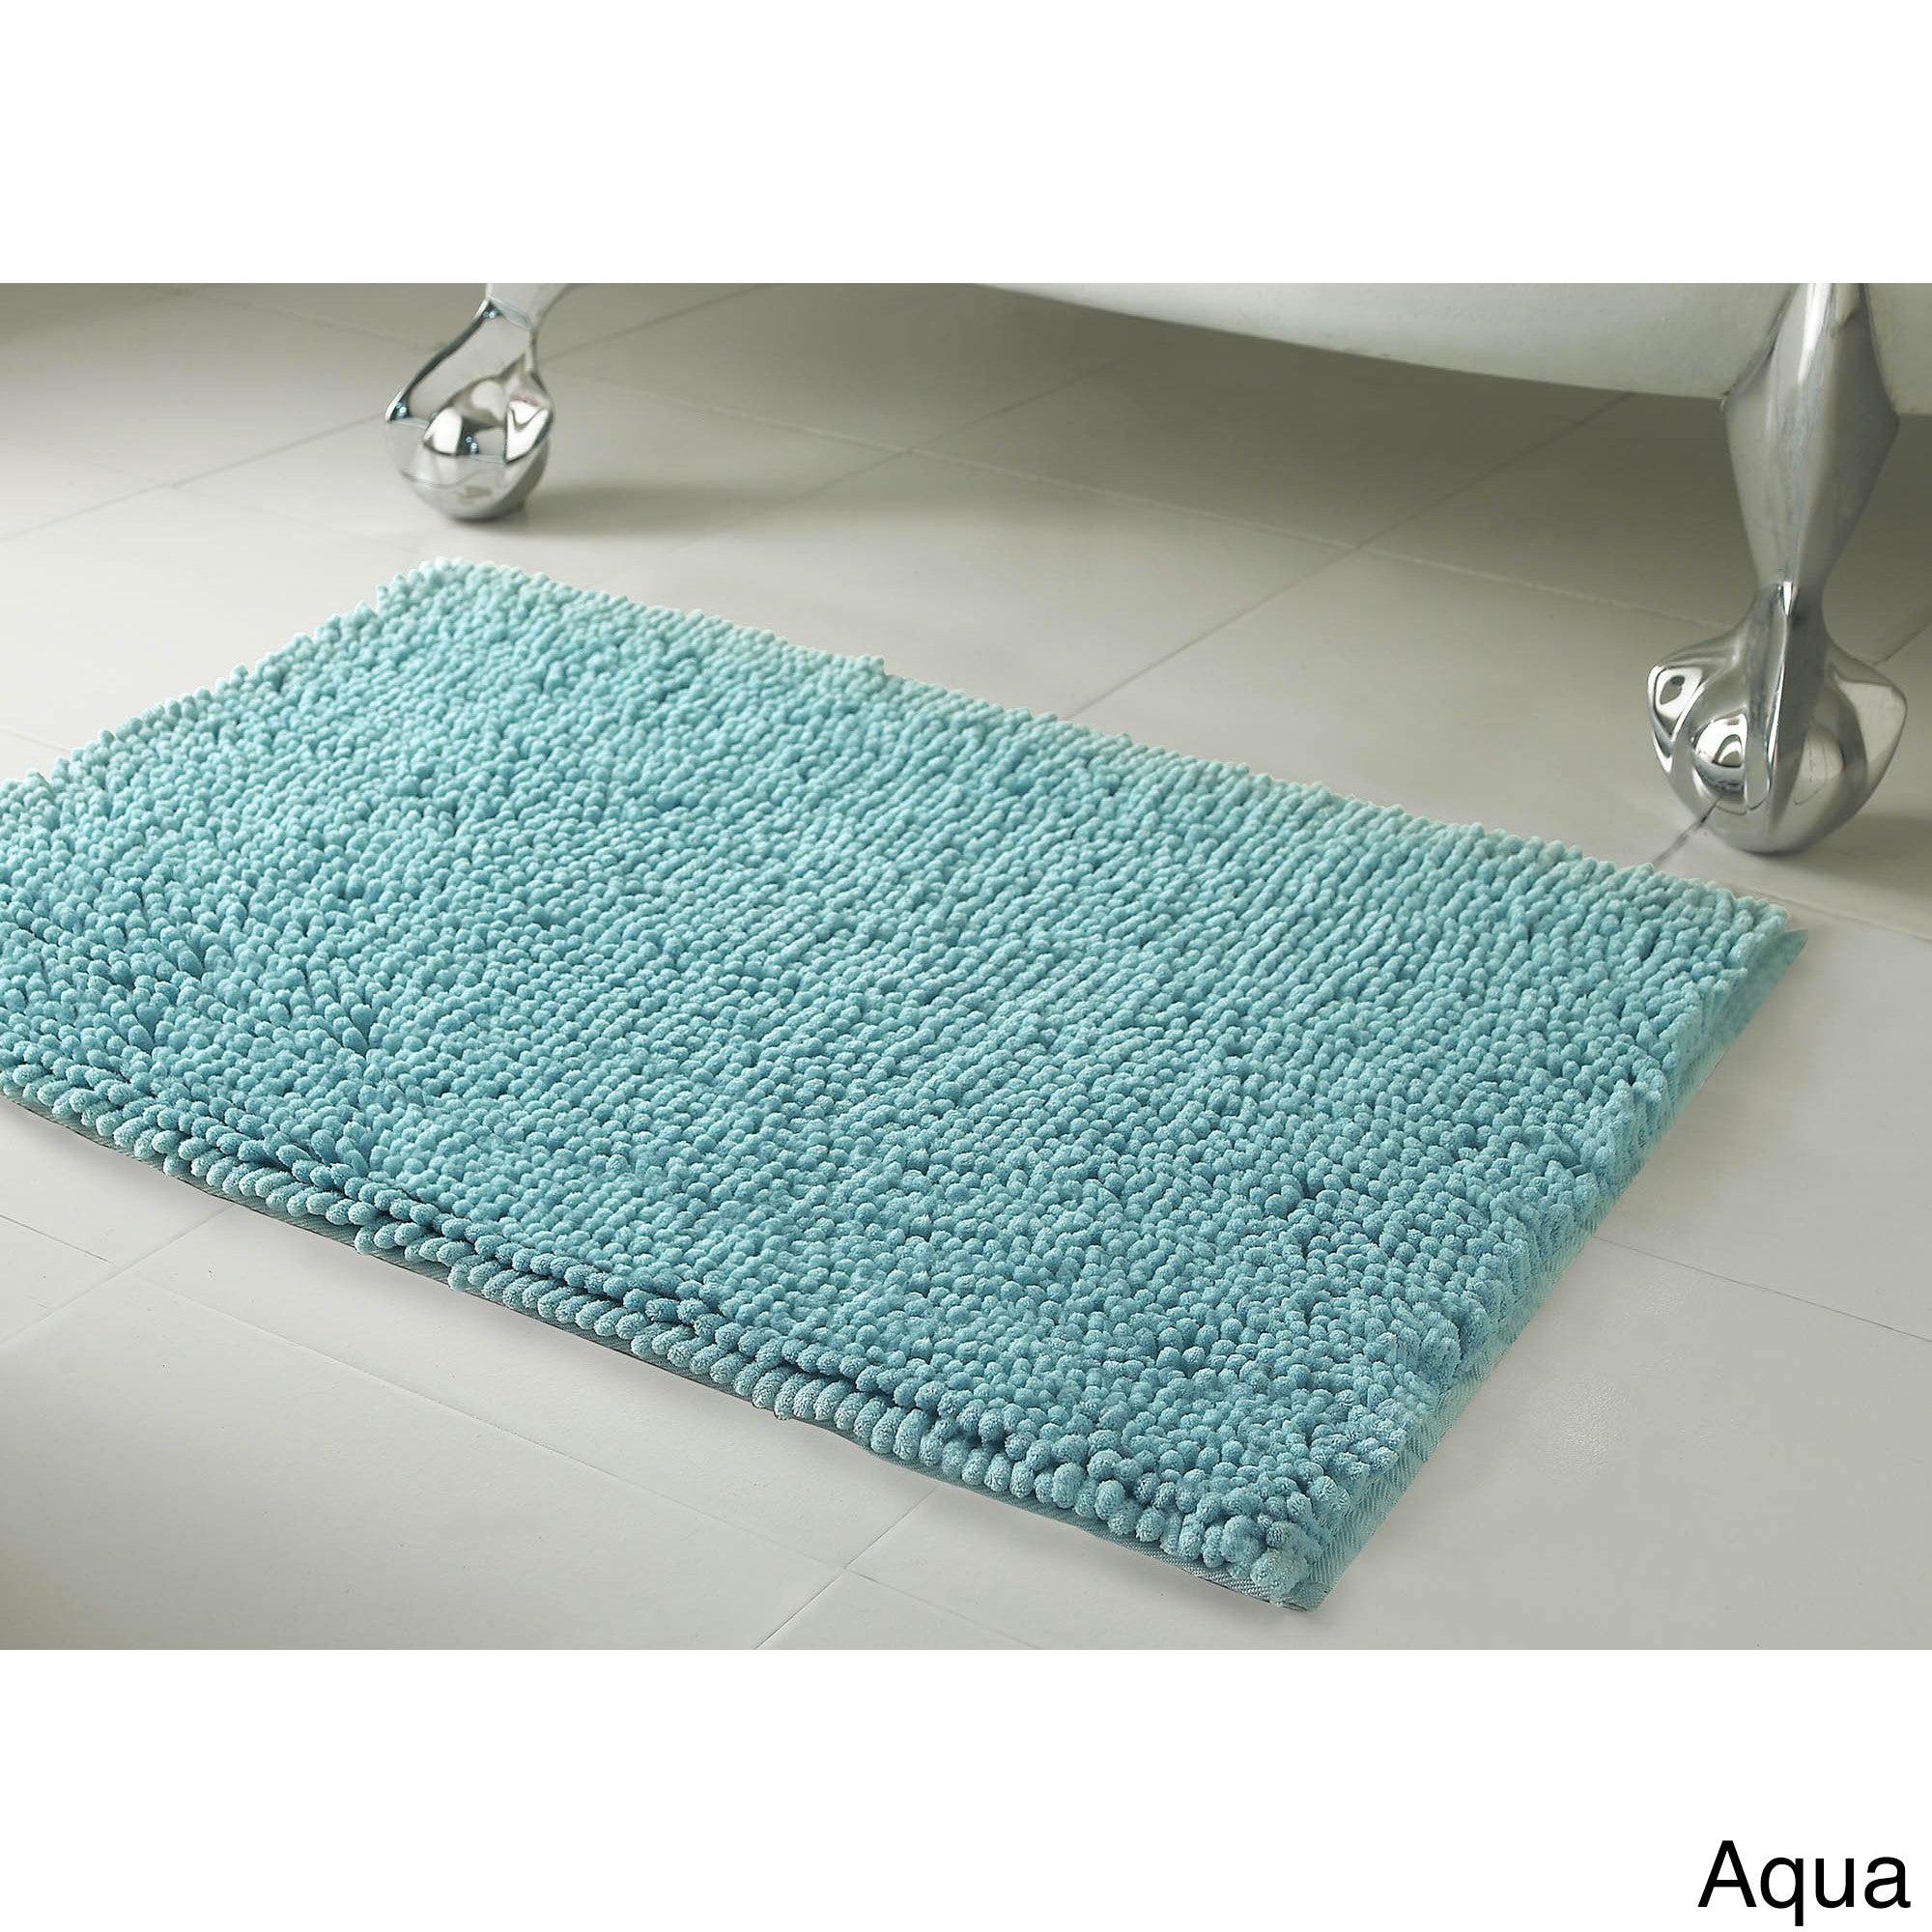 Shop Resort Collection Plush Shag Chenille Bath Mat (17 inches x 24 ...